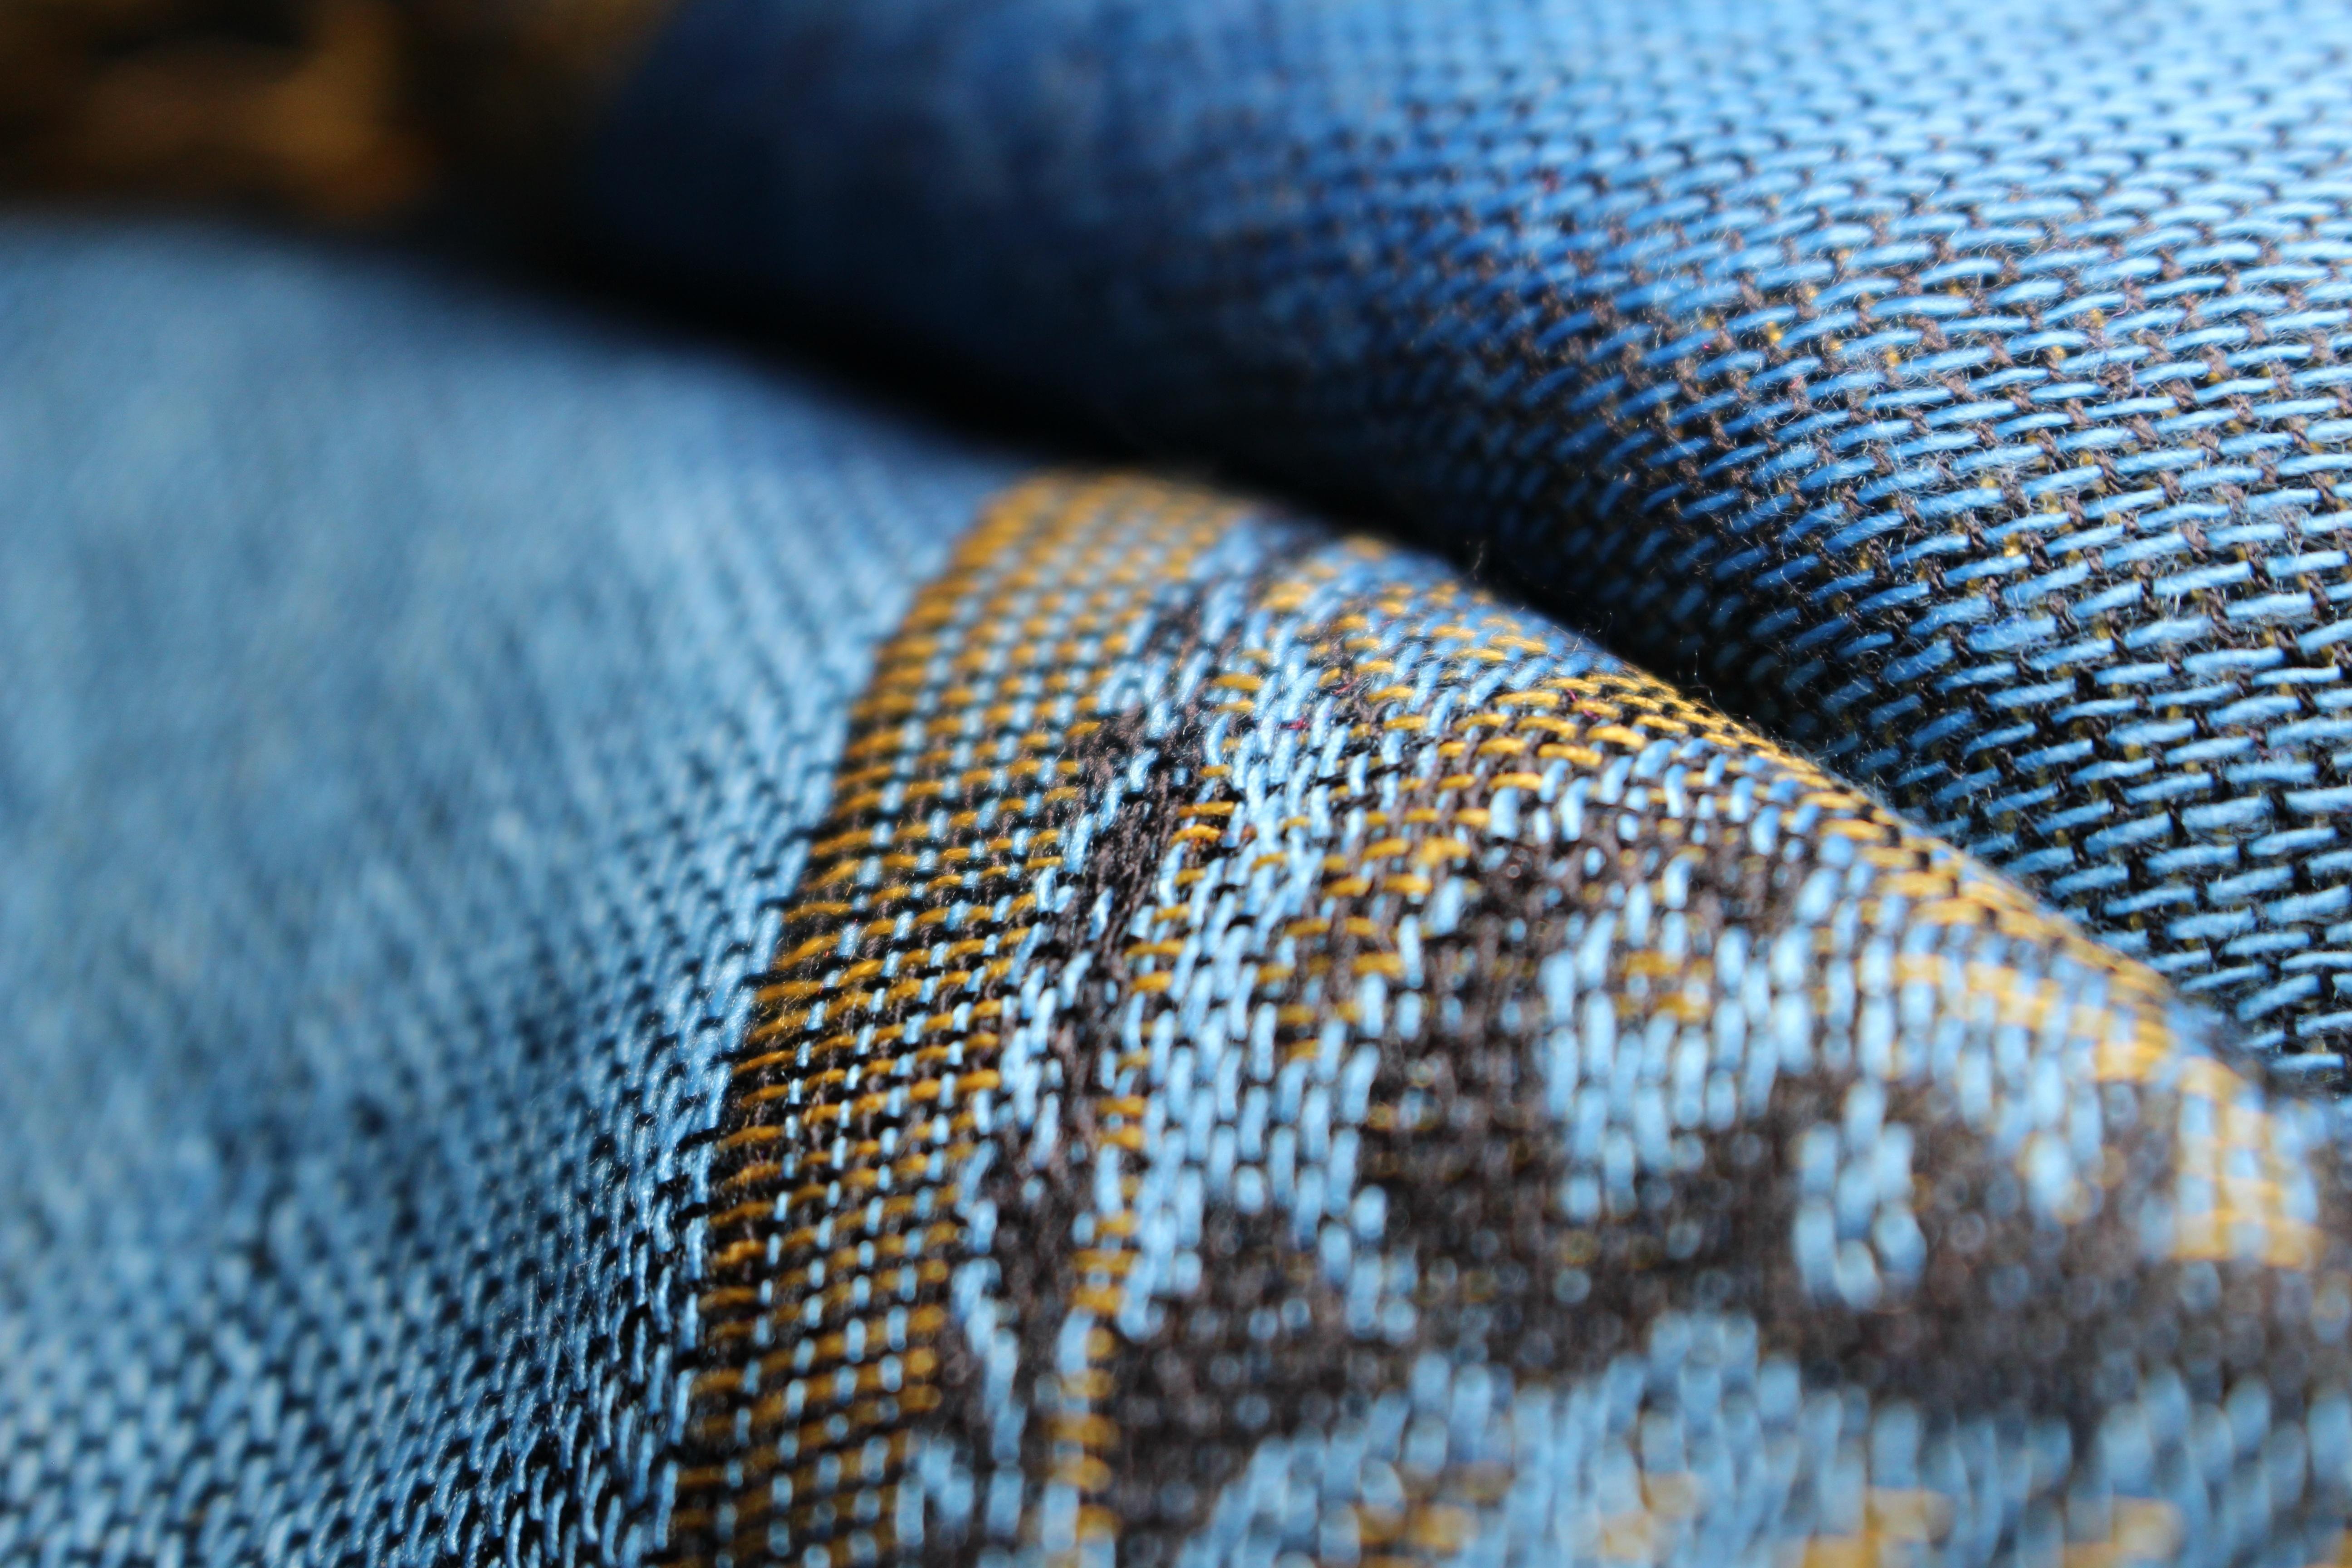 Kostenlose foto : Hand, Textur, Blatt, Muster, Farbe, blau, Kunst ...